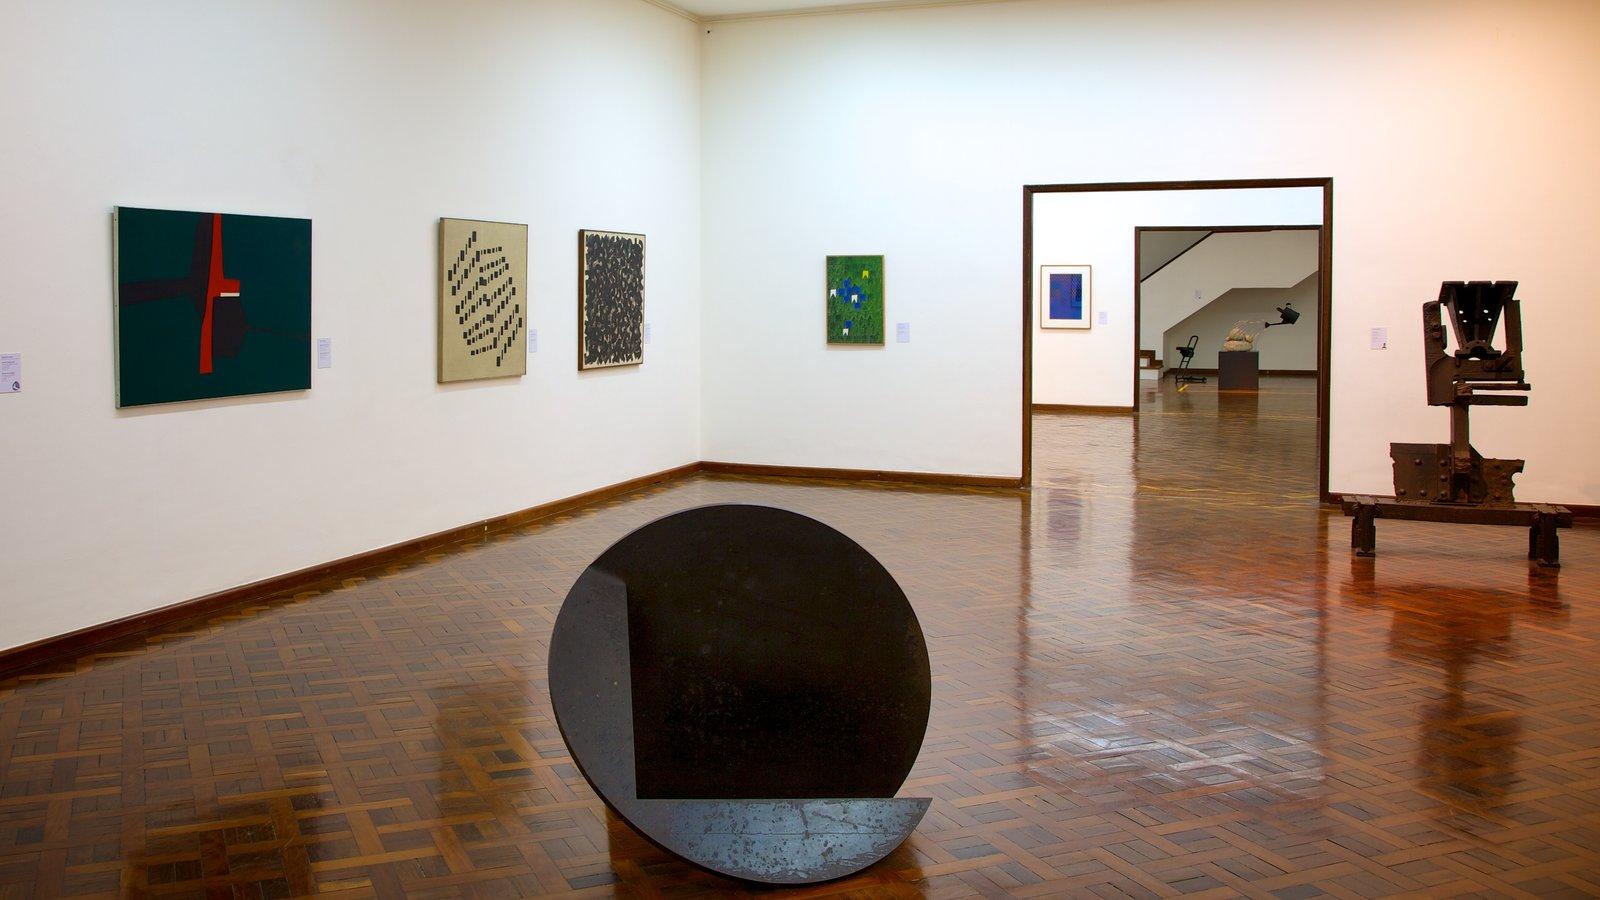 Museu Nacional de Belas Artes caracterizando arte e vistas internas